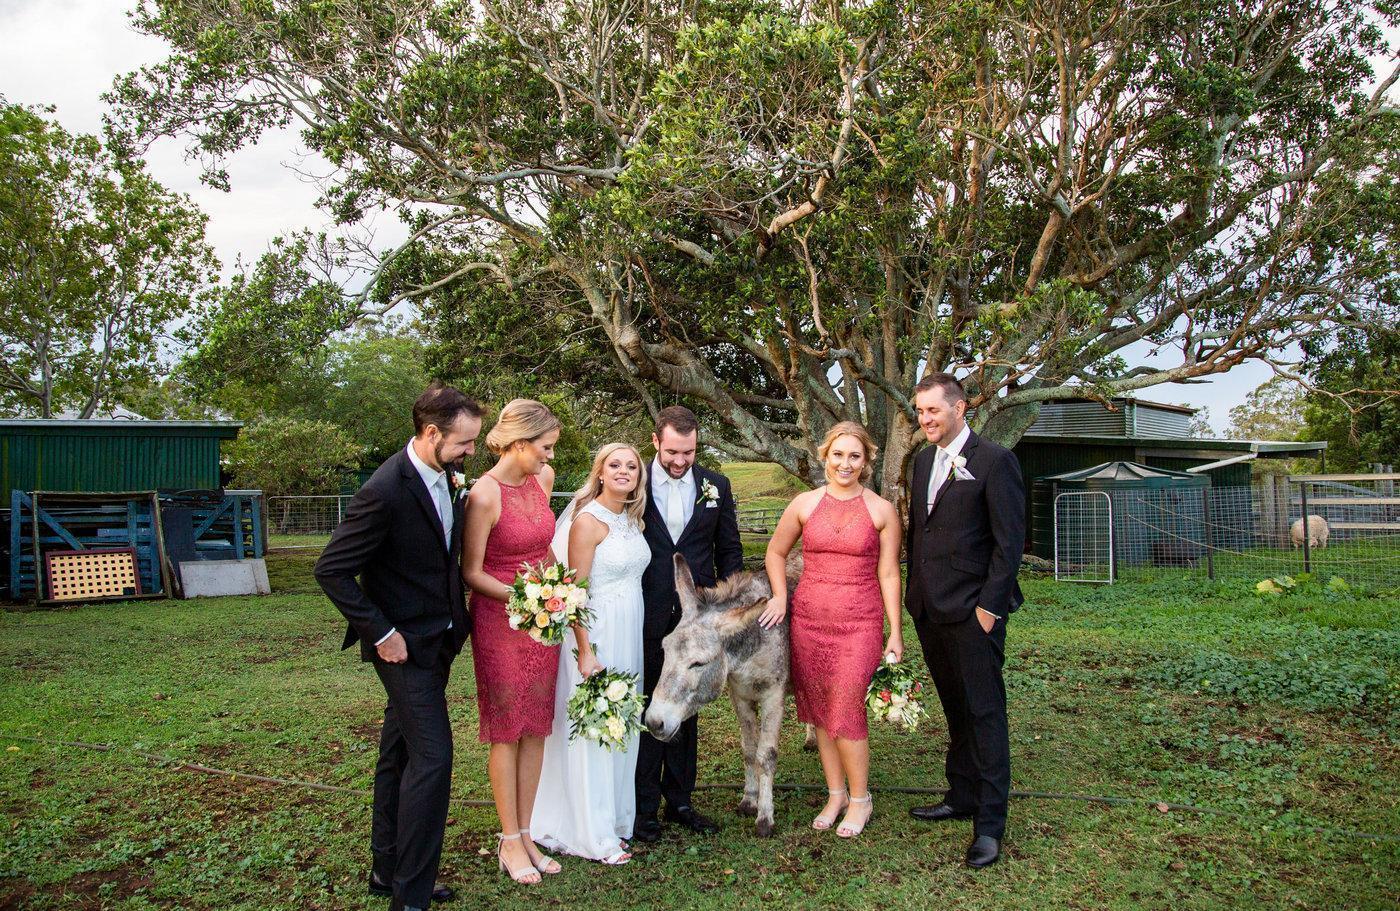 Wedding Photography bridal party with donkey